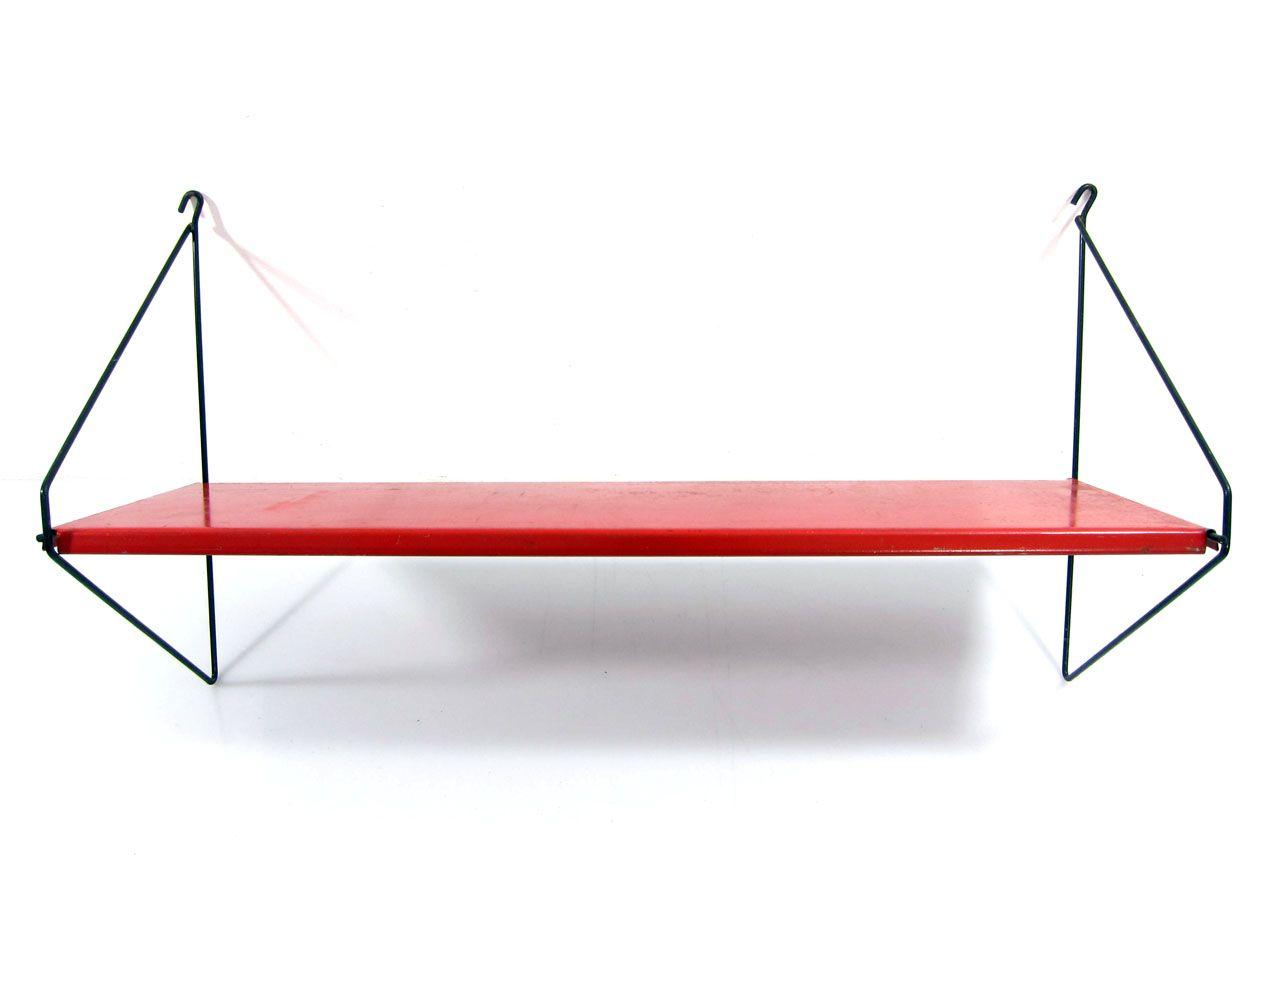 Wondrous Red Mategot Style Red Sixties Shelf Interior Design Ideas Clesiryabchikinfo